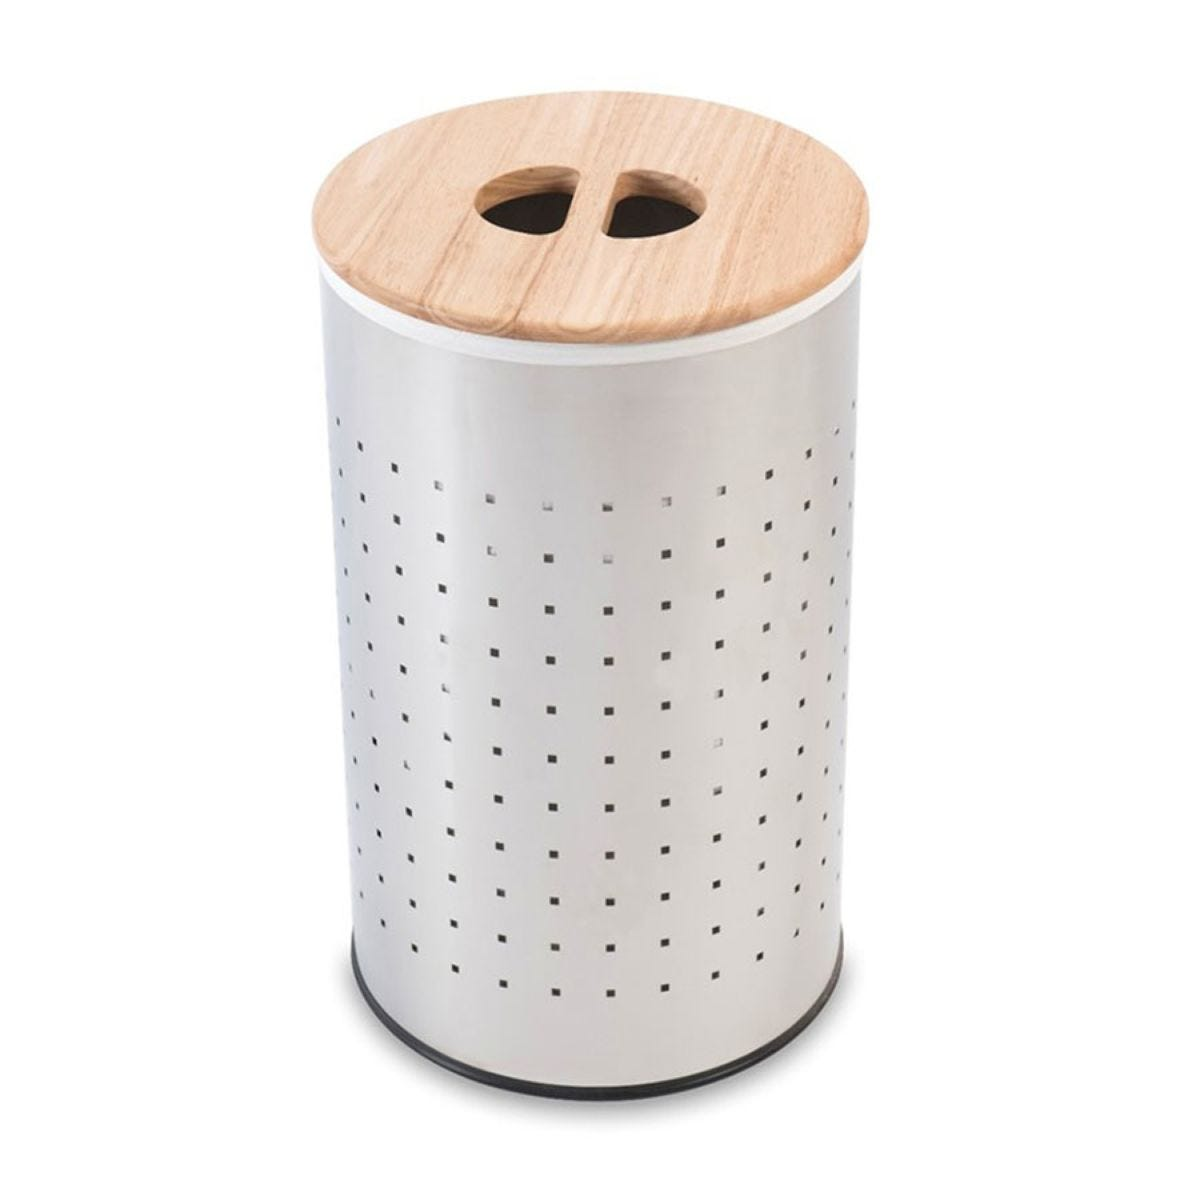 Sabichi Stainless Steel Laundry Bin - Silver